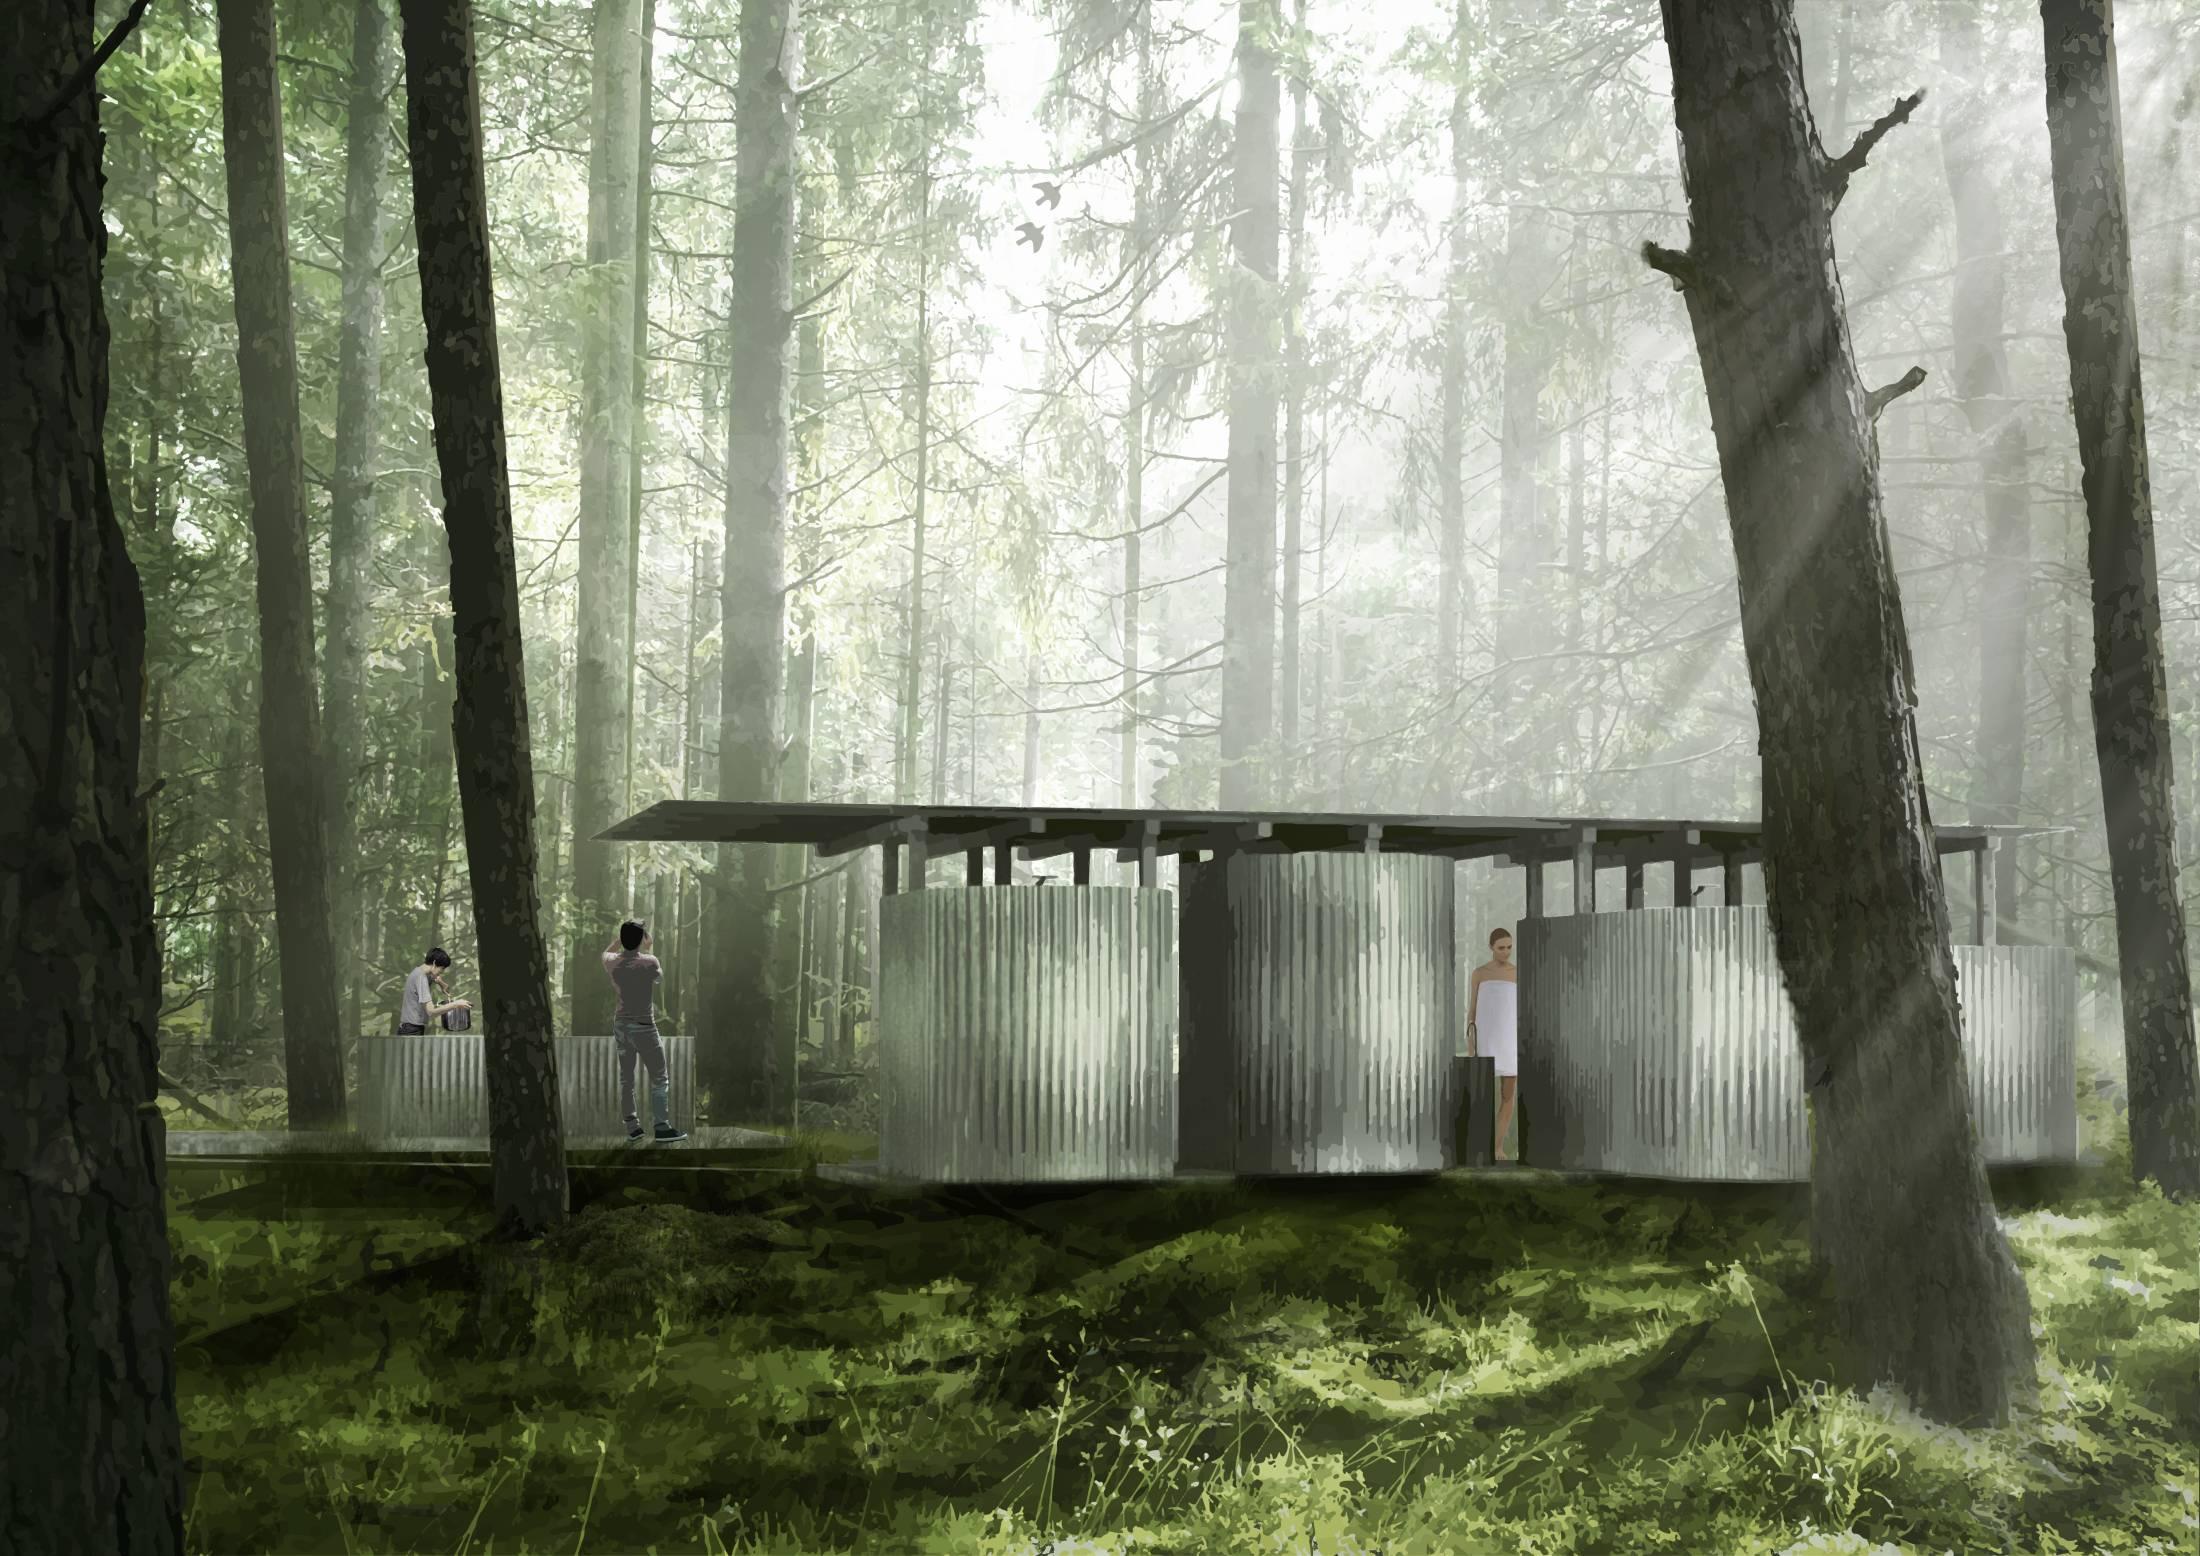 Treetop-Hotel_Denmark_lovtag_Architect-Sigurd-Larsen-axo-forest-outdoor-SHOWERS-pine-tree-friluftsbad-1100x778@2x.jpg